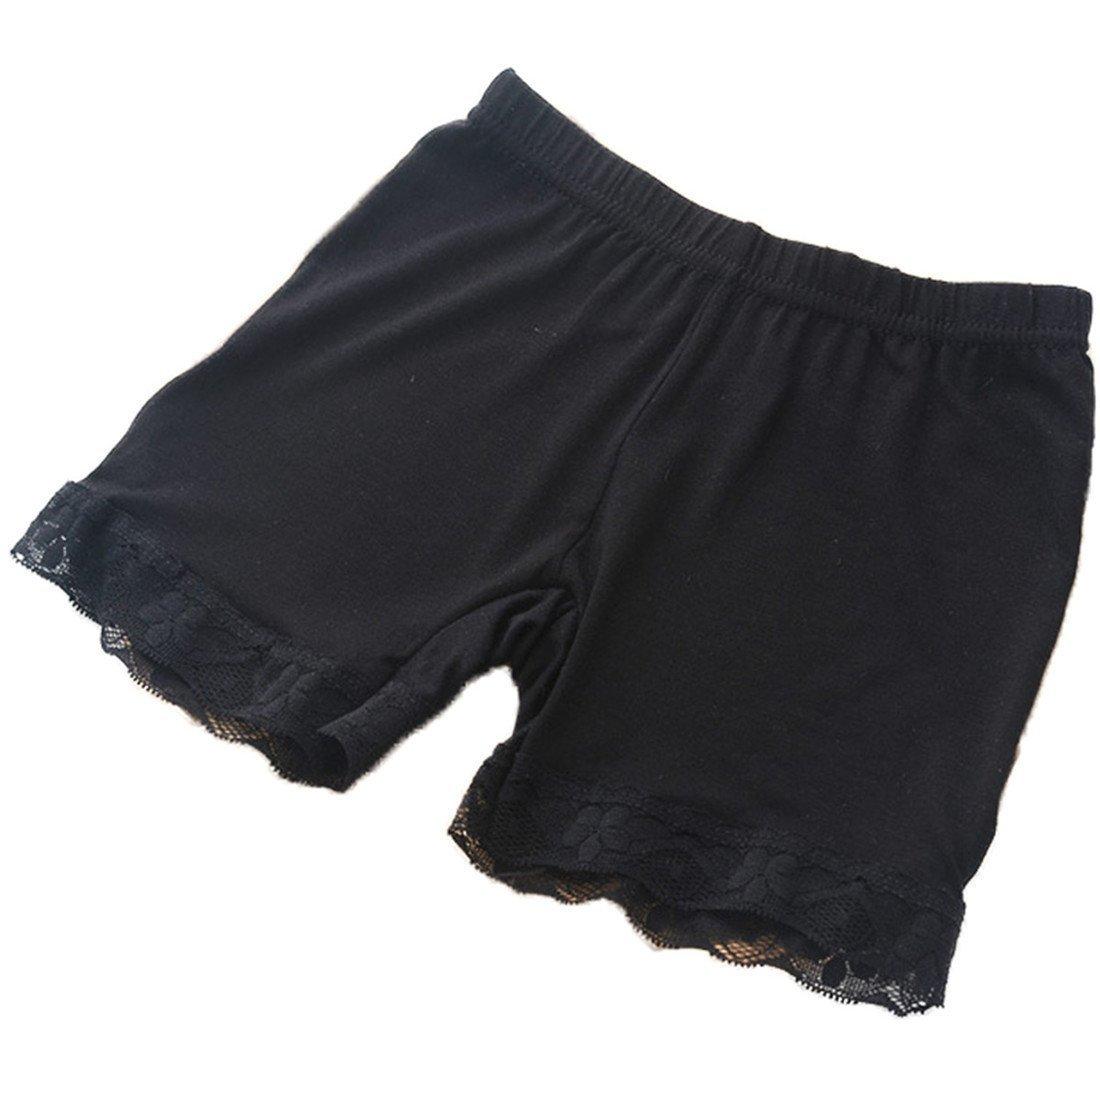 Maylife Little Girls Kids 4 Pcs Boy-Leg Slim Elastic Safety Short Lace Leggings Panties Underwear